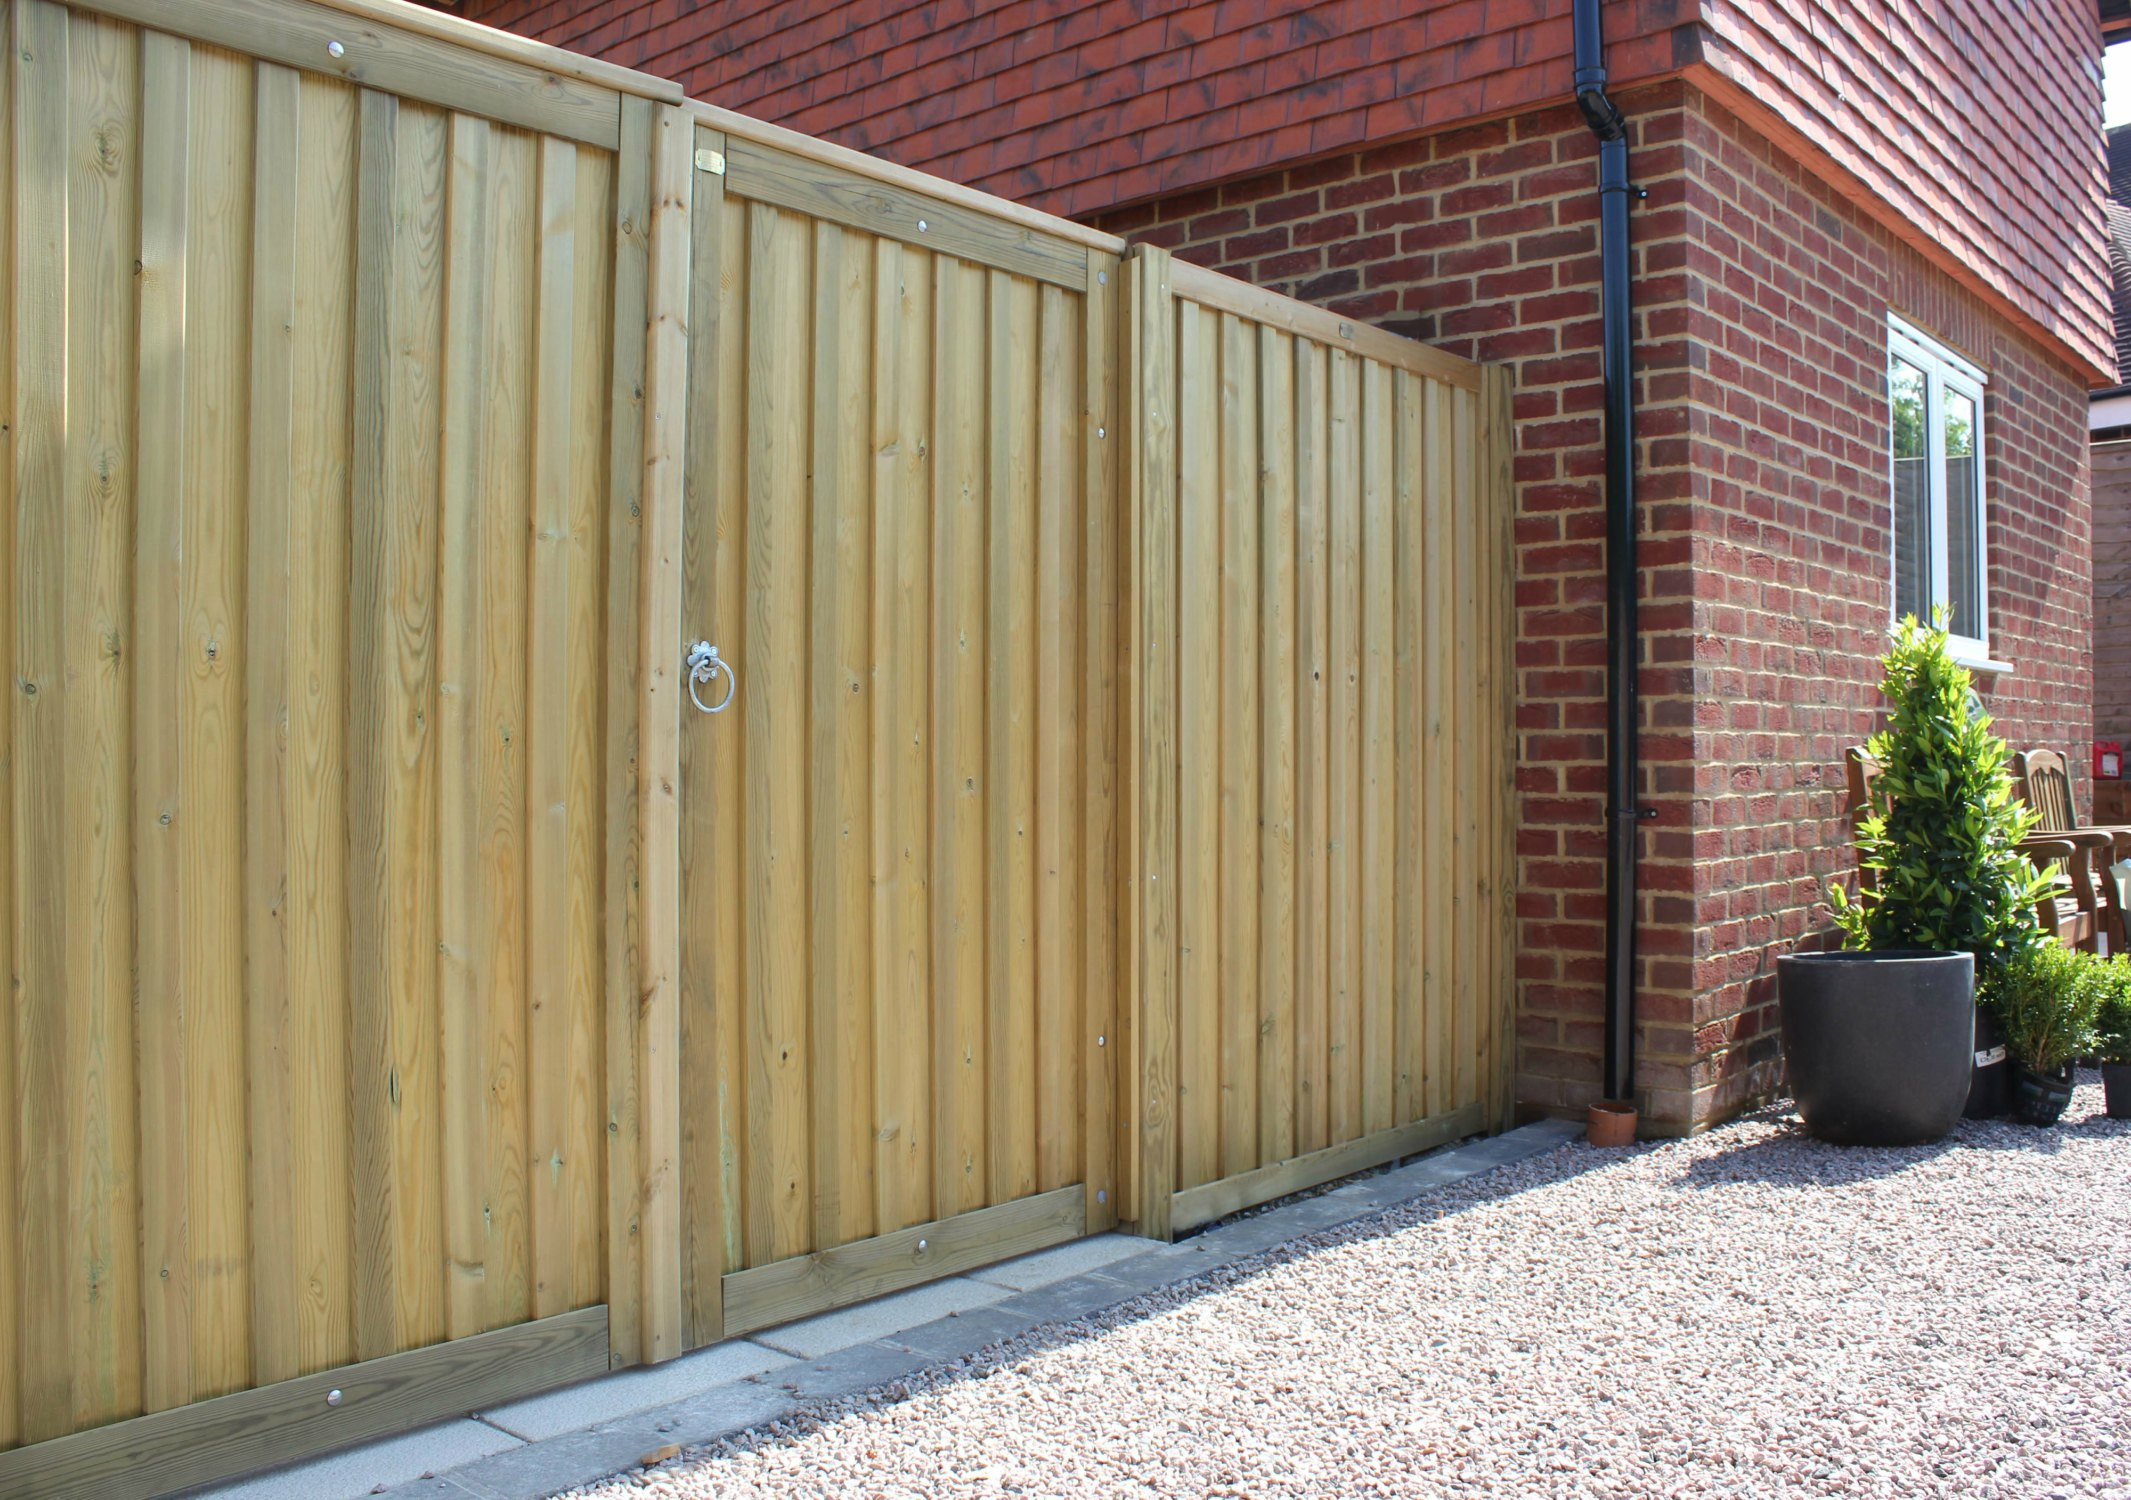 Backyard Fence Door  What to consider when choosing garden fencing Growing Family